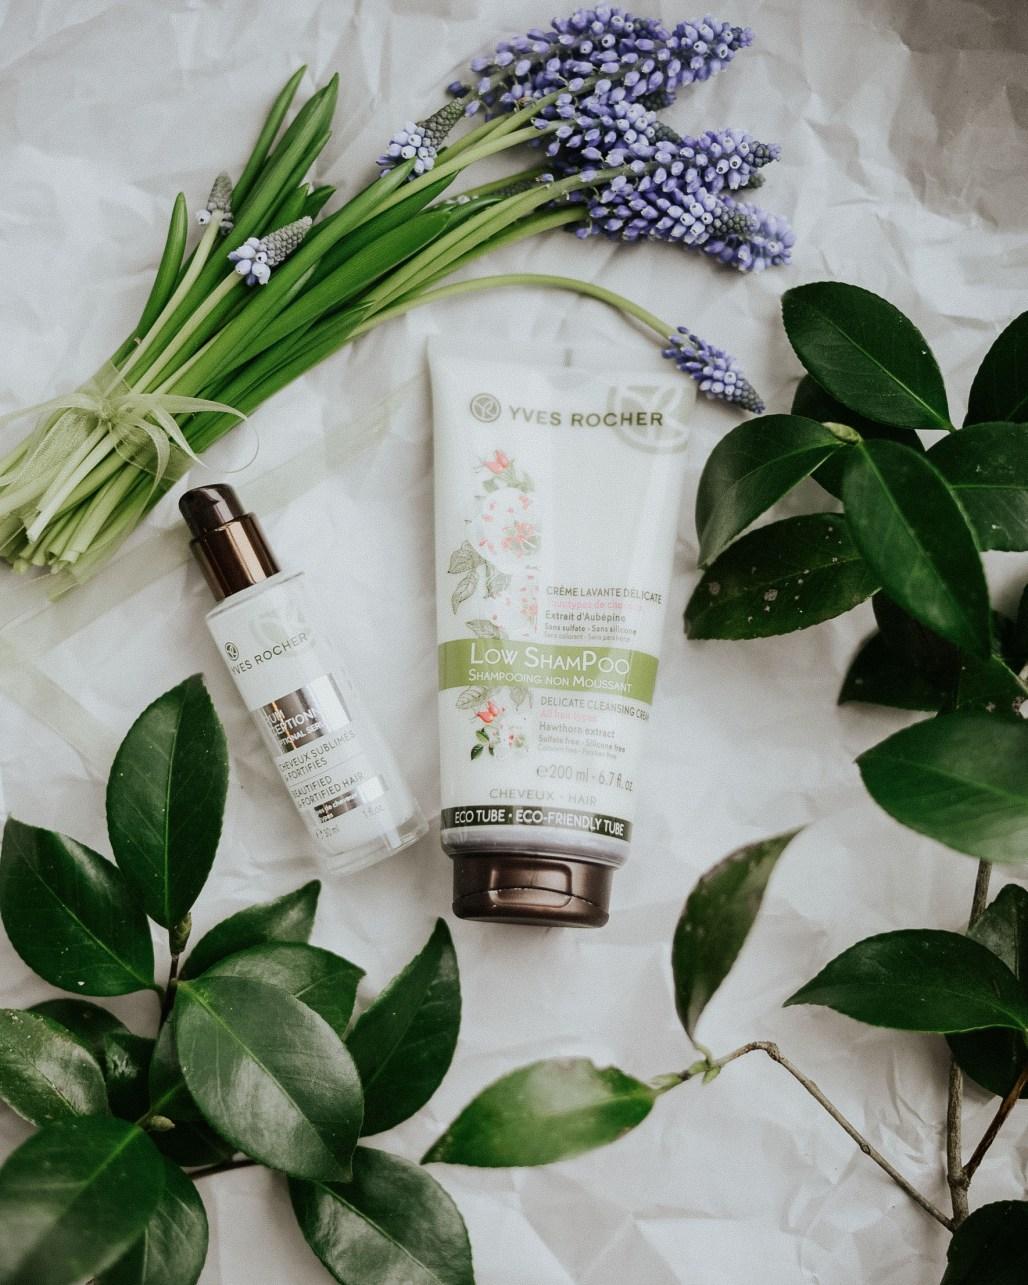 yves-rocher-low-shampoo-9